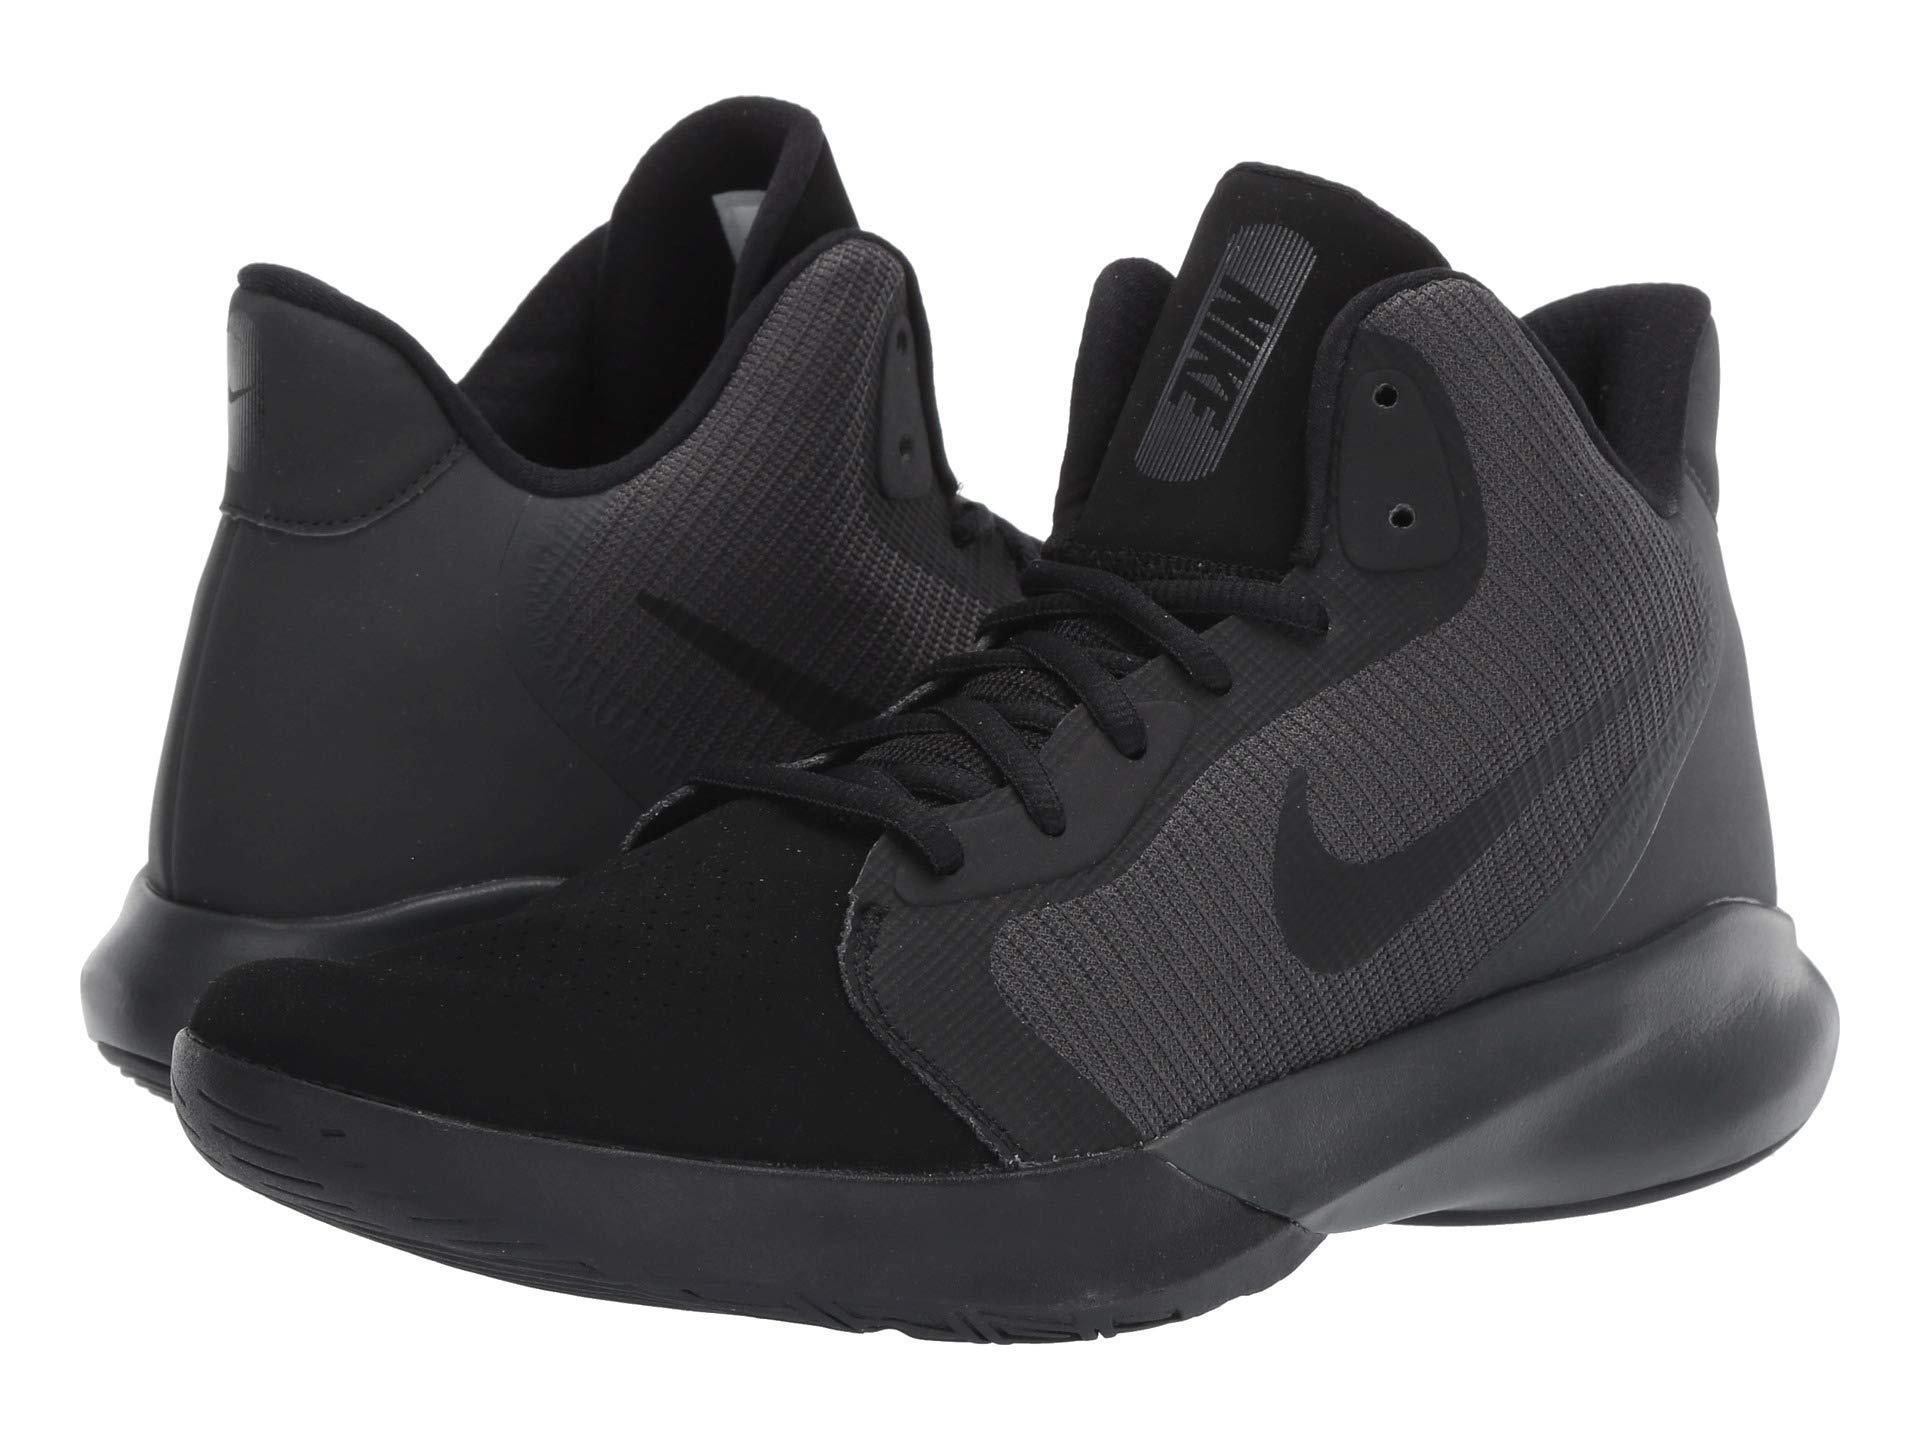 Nike Rubber Precision Iii Nbk in Black